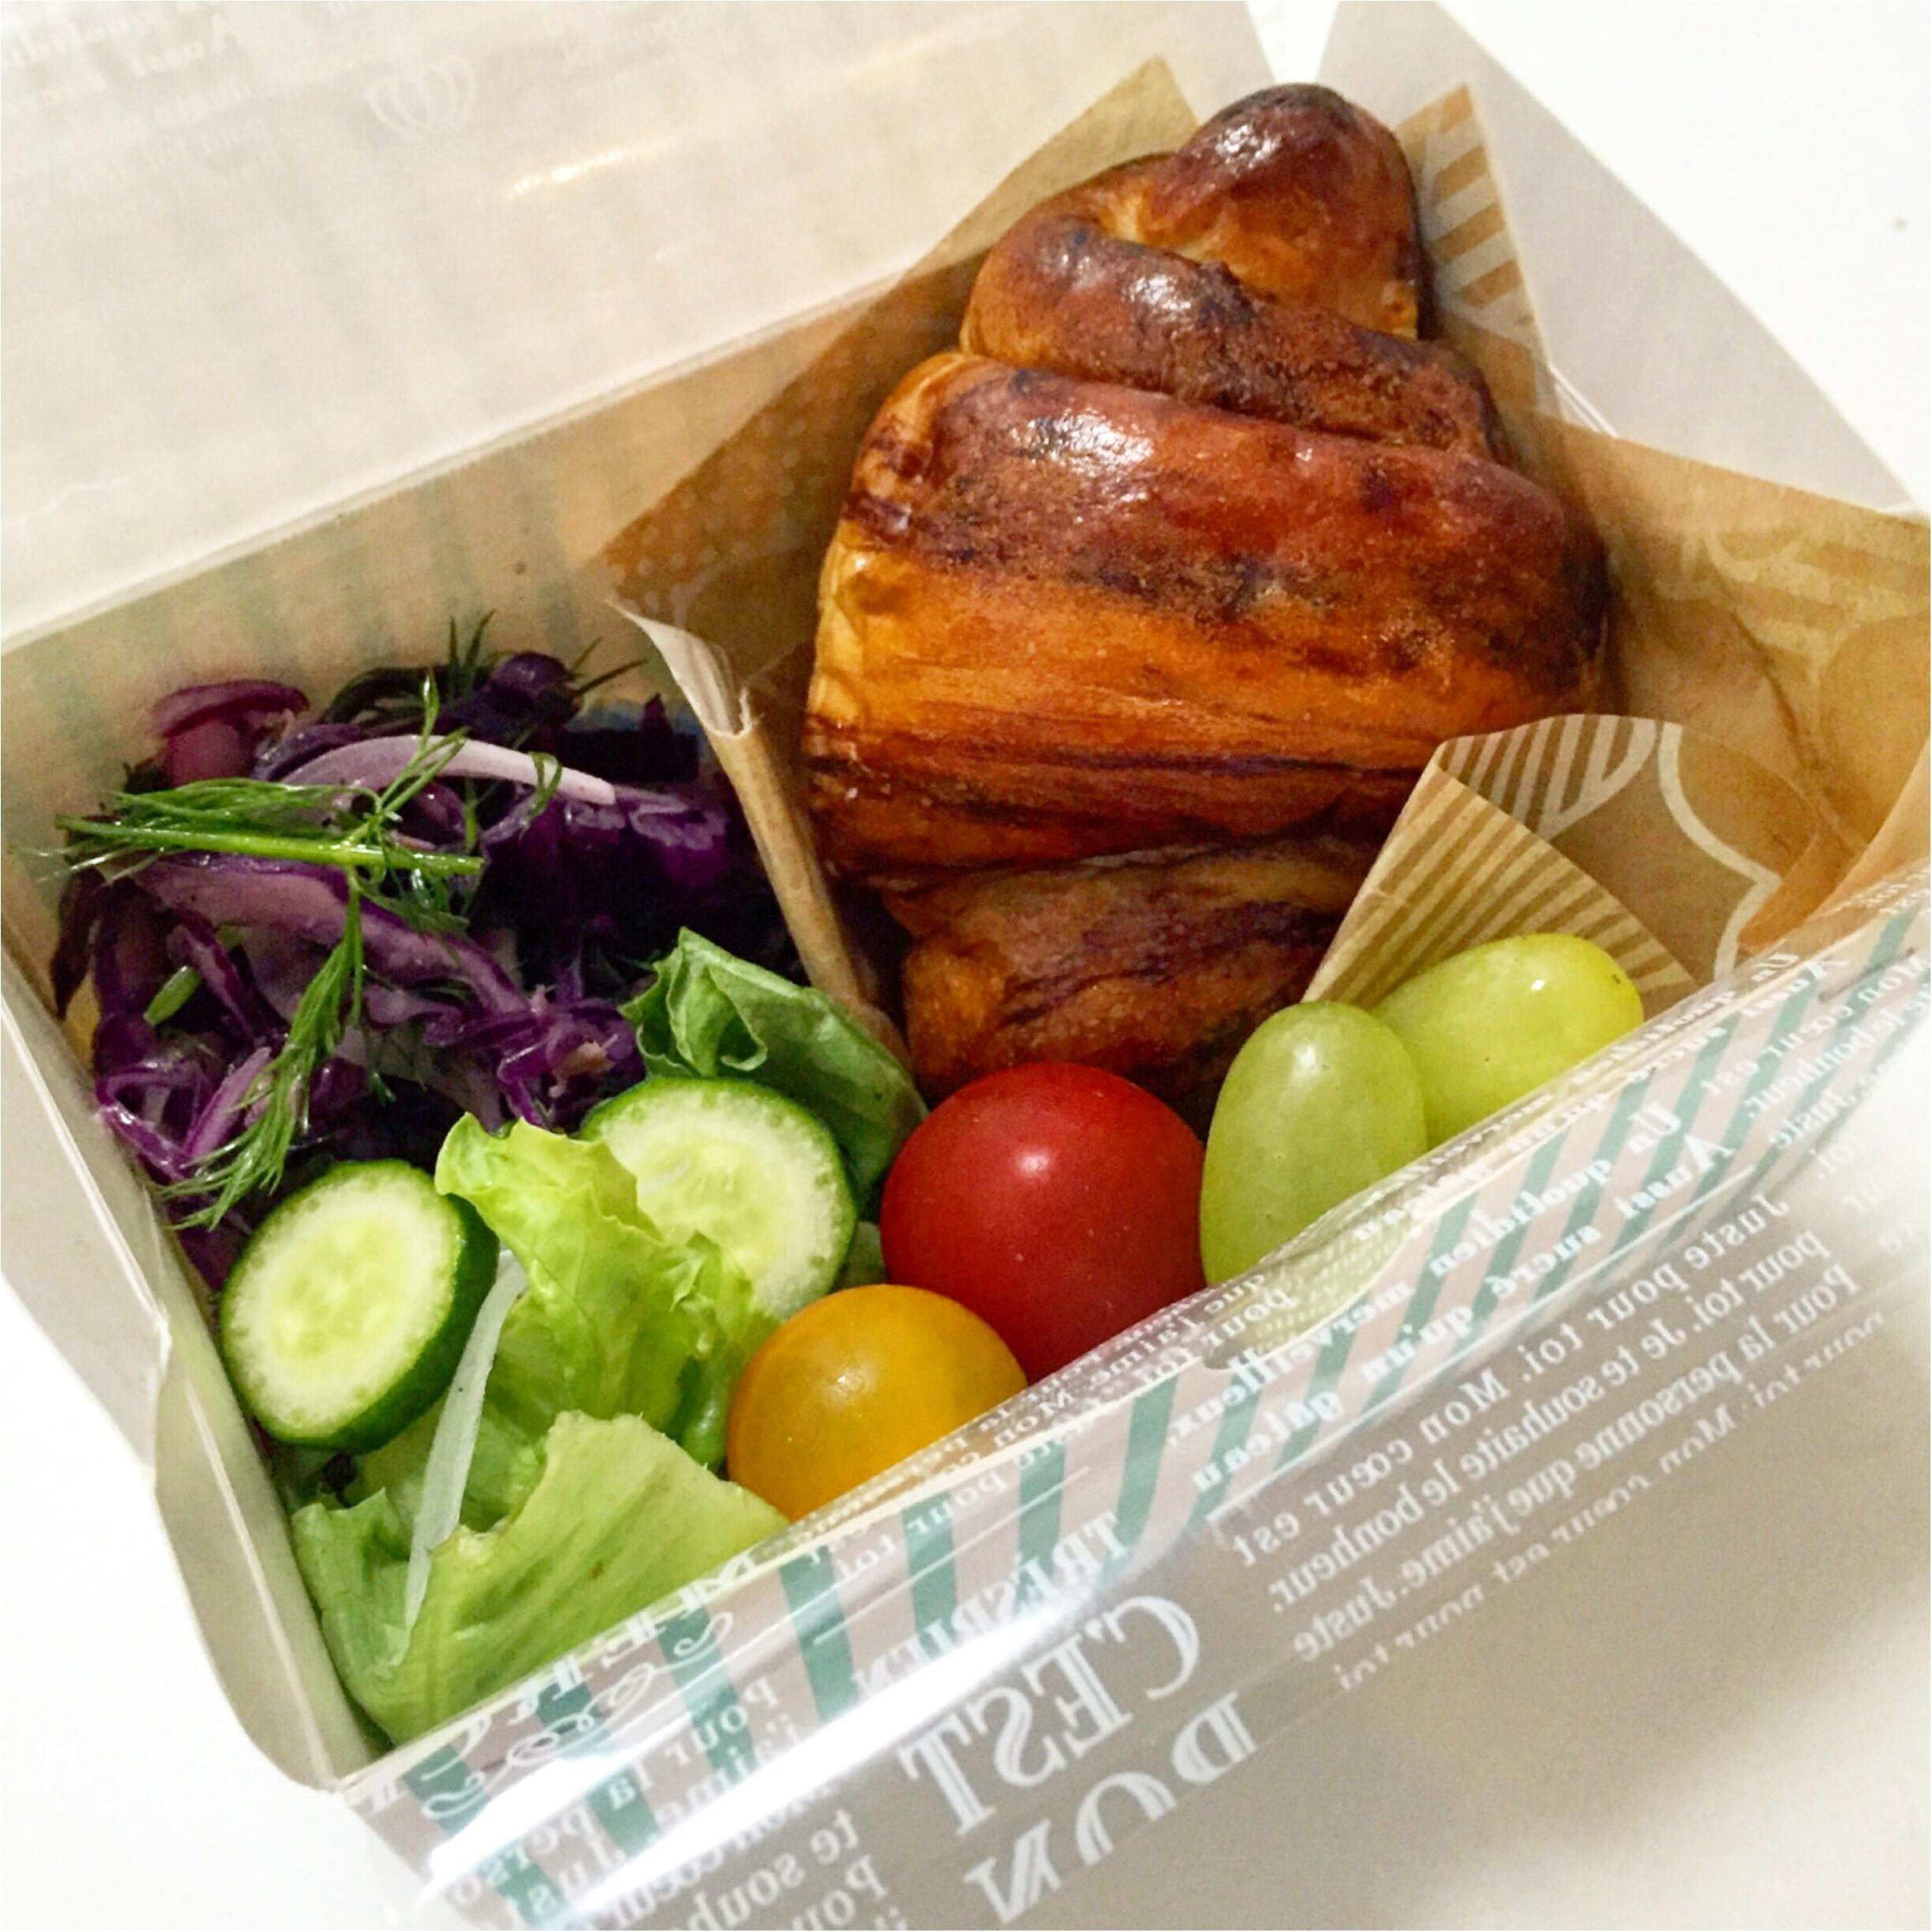 MORE7月号掲載サラダレシピフル活用!1週間の常備菜とお弁当***さっこ_2